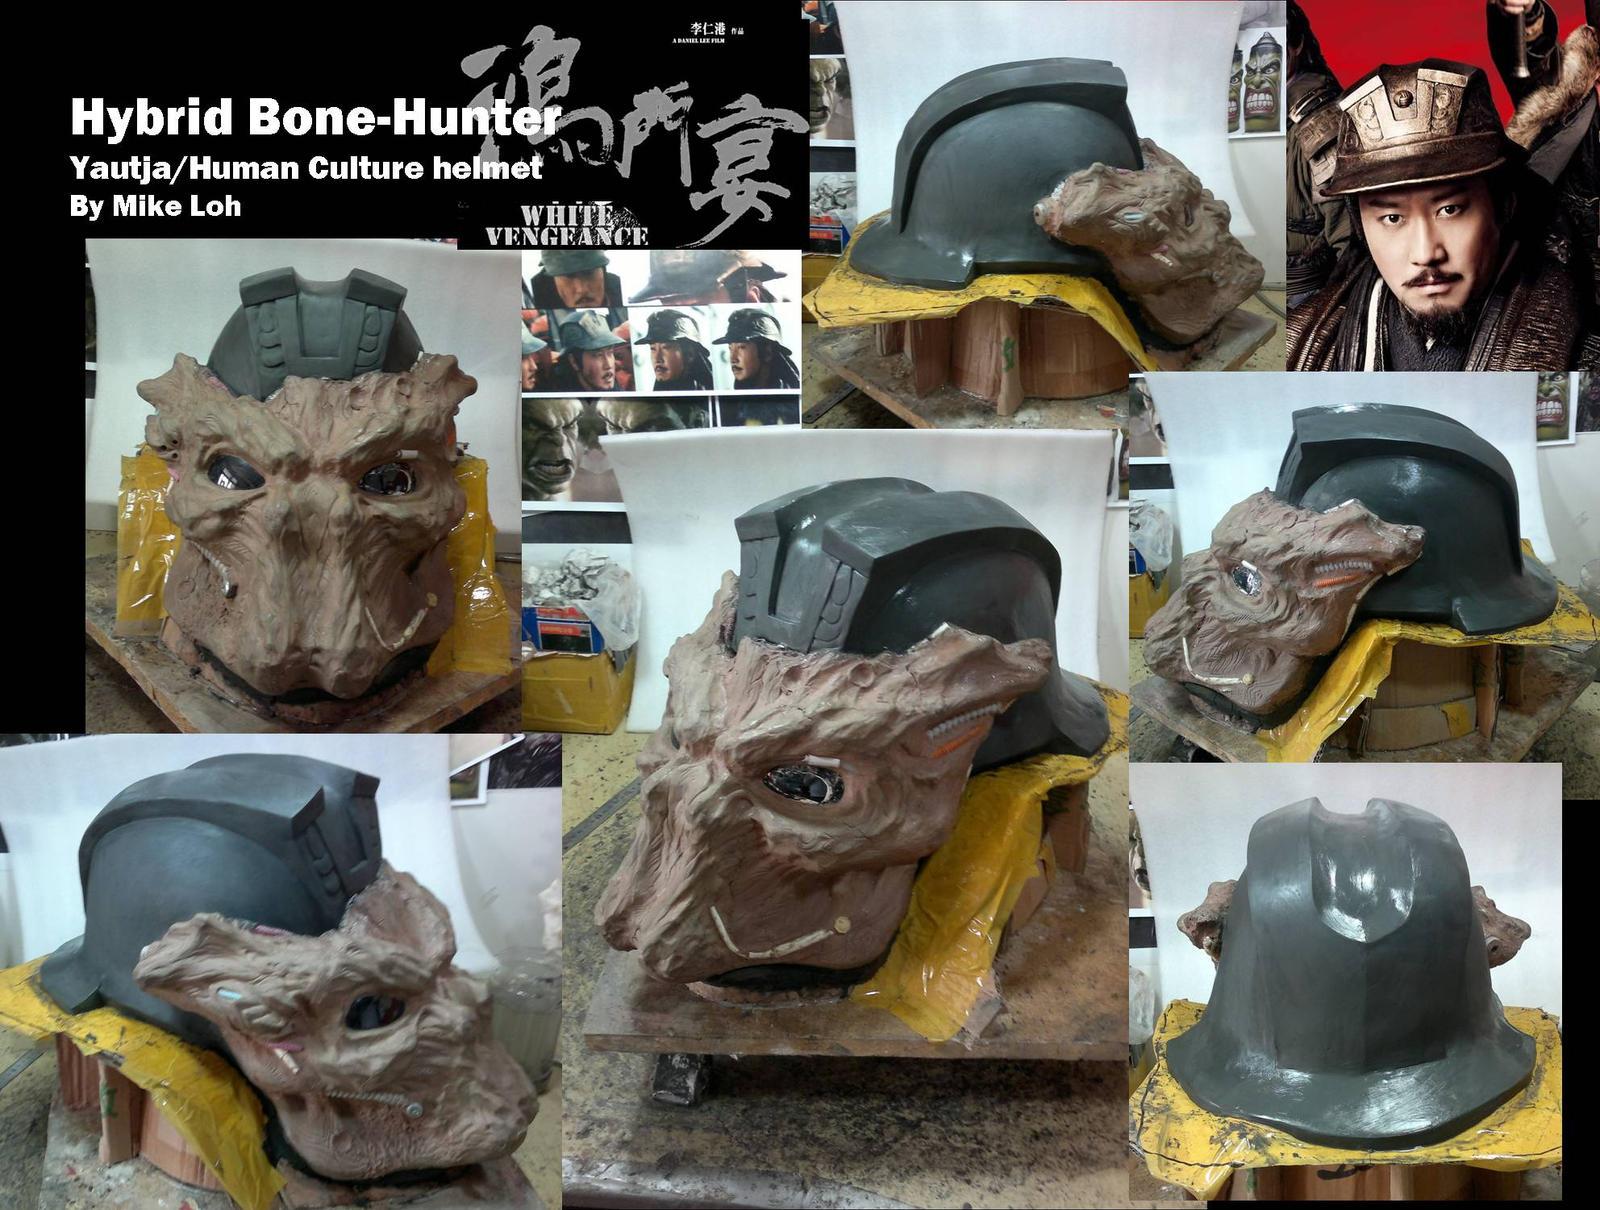 Bonehunter hybrid helmet by uratz studios on deviantart - Uratz studios ...